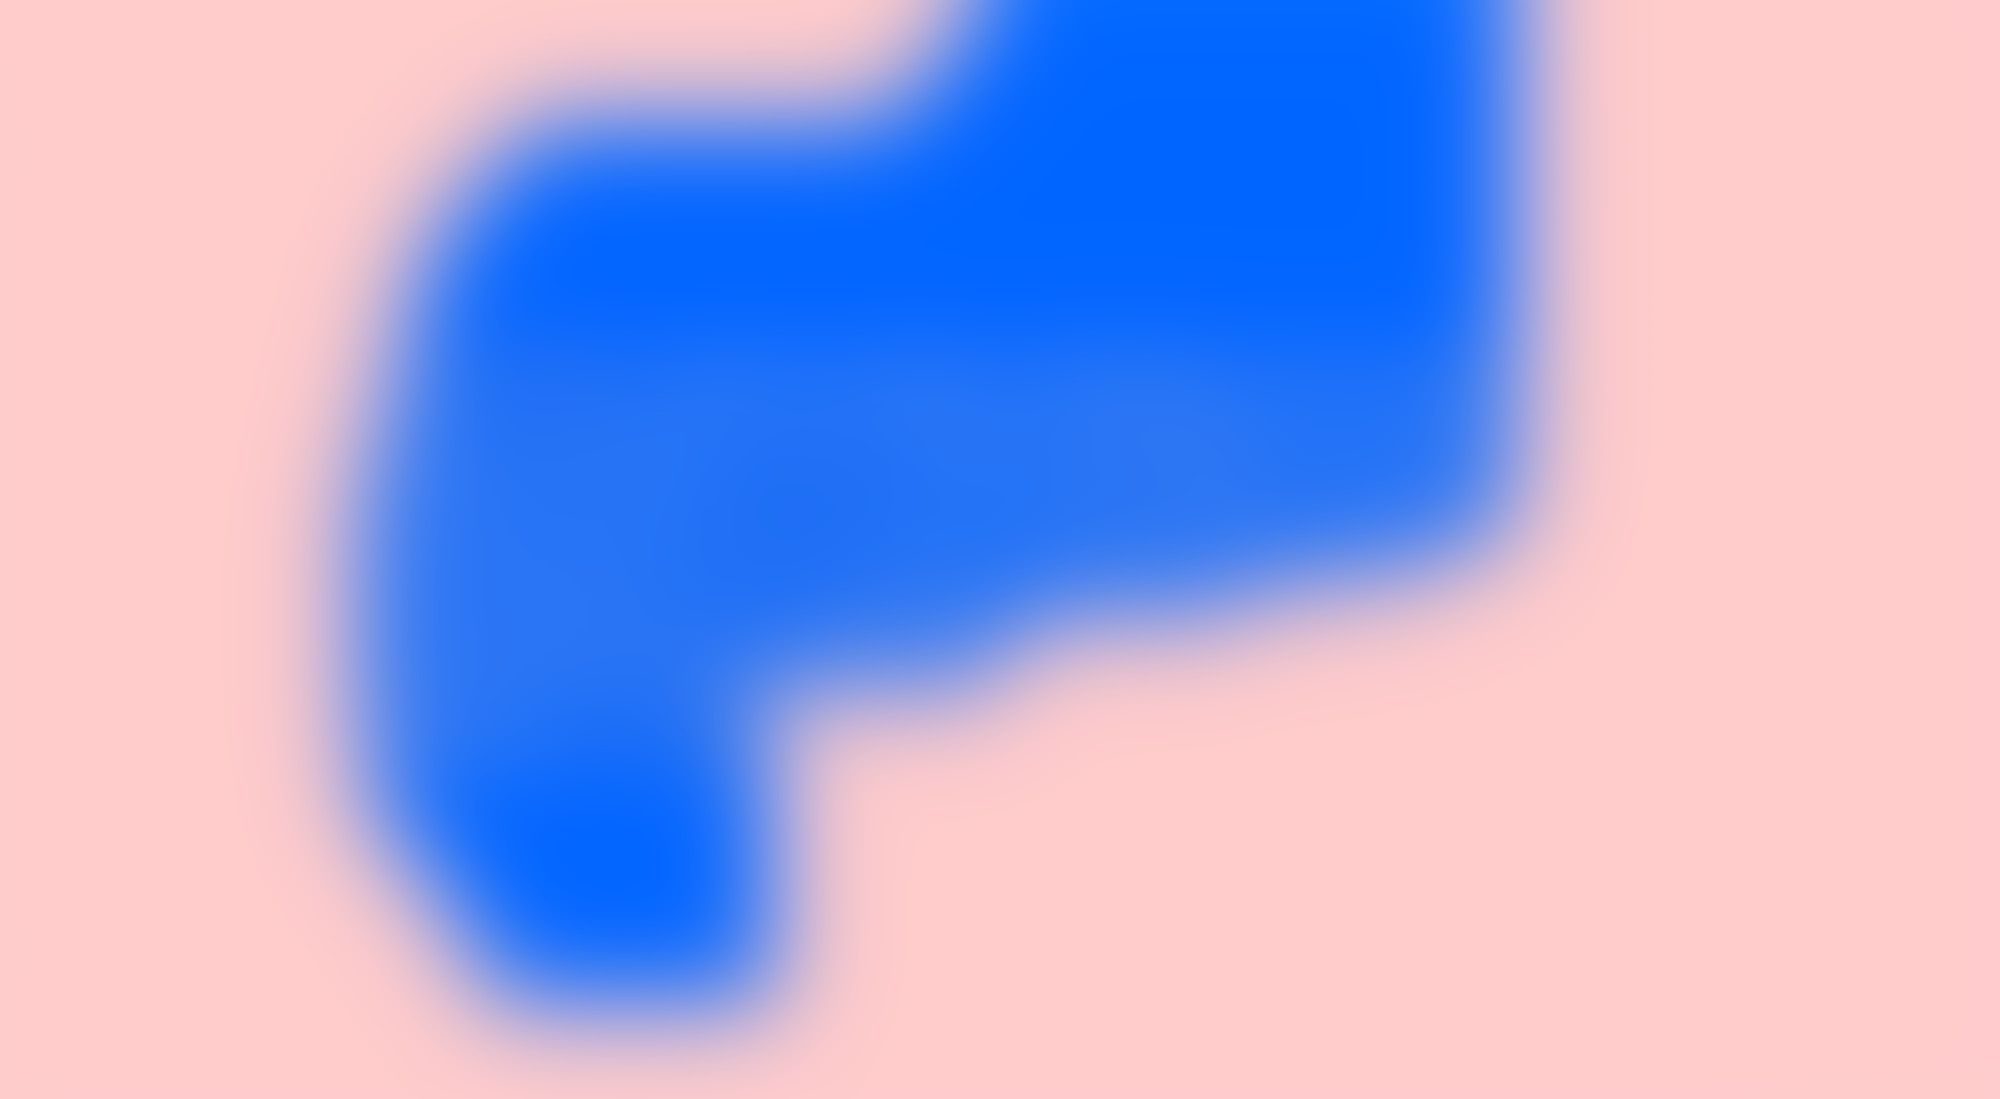 First version of my website 2 autocompressfitresizeixlibphp 1 1 0max h2000max w3 D2000q80sc0969512ccc84ff2e6c7444bb968110d